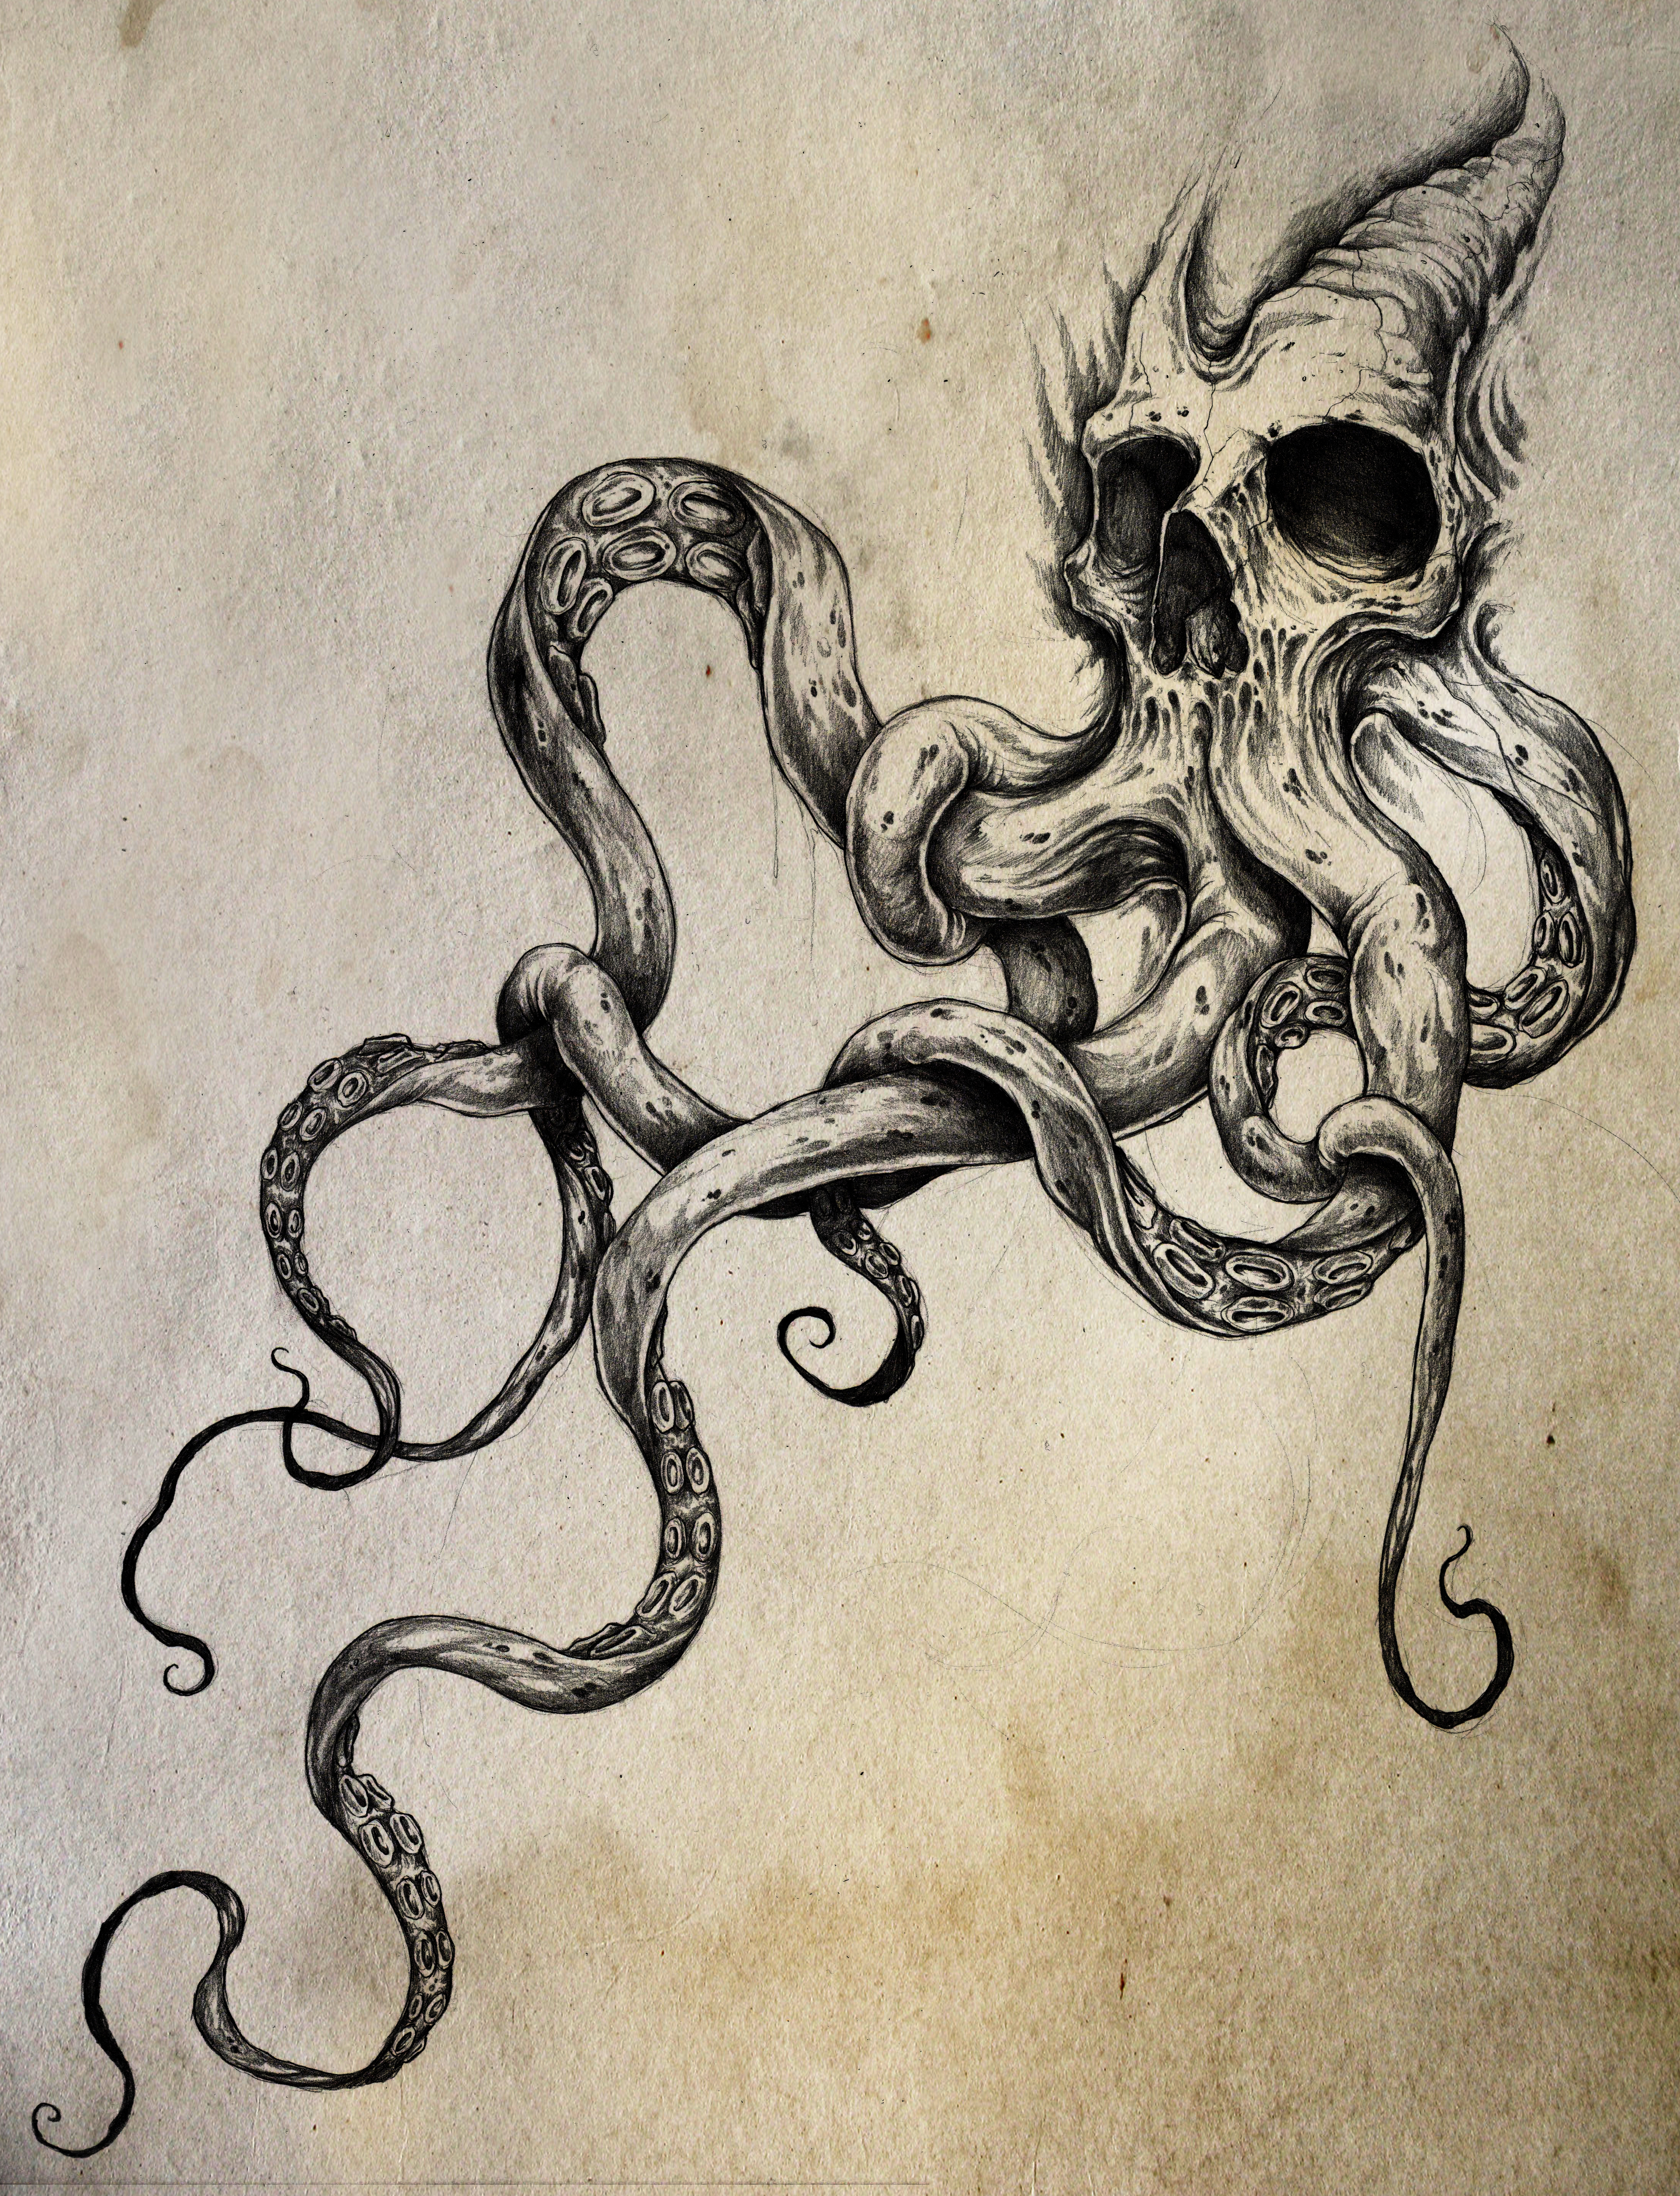 Skulltapus